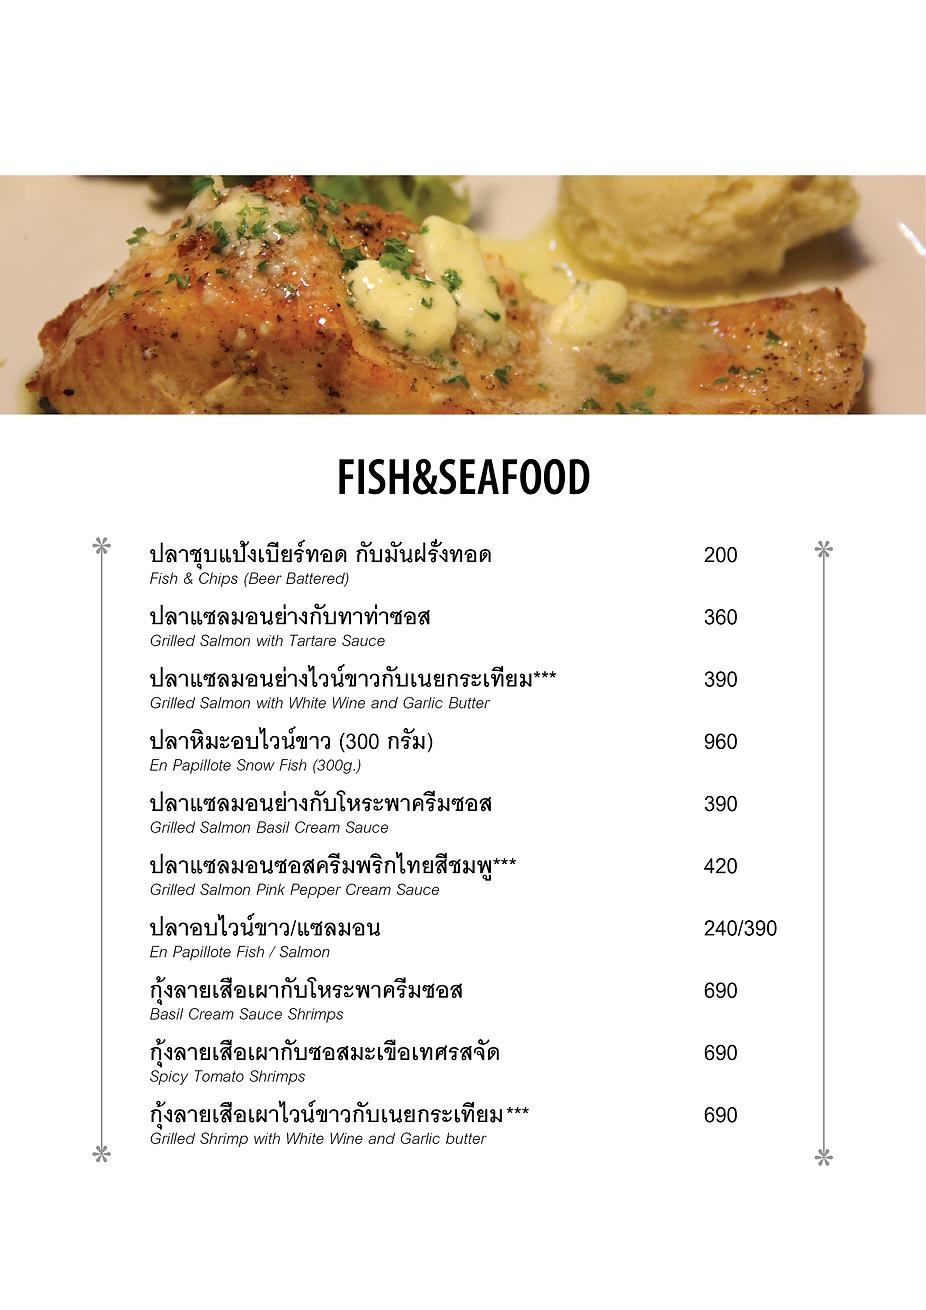 Chef's Table Steve Menu Fish & Seafood